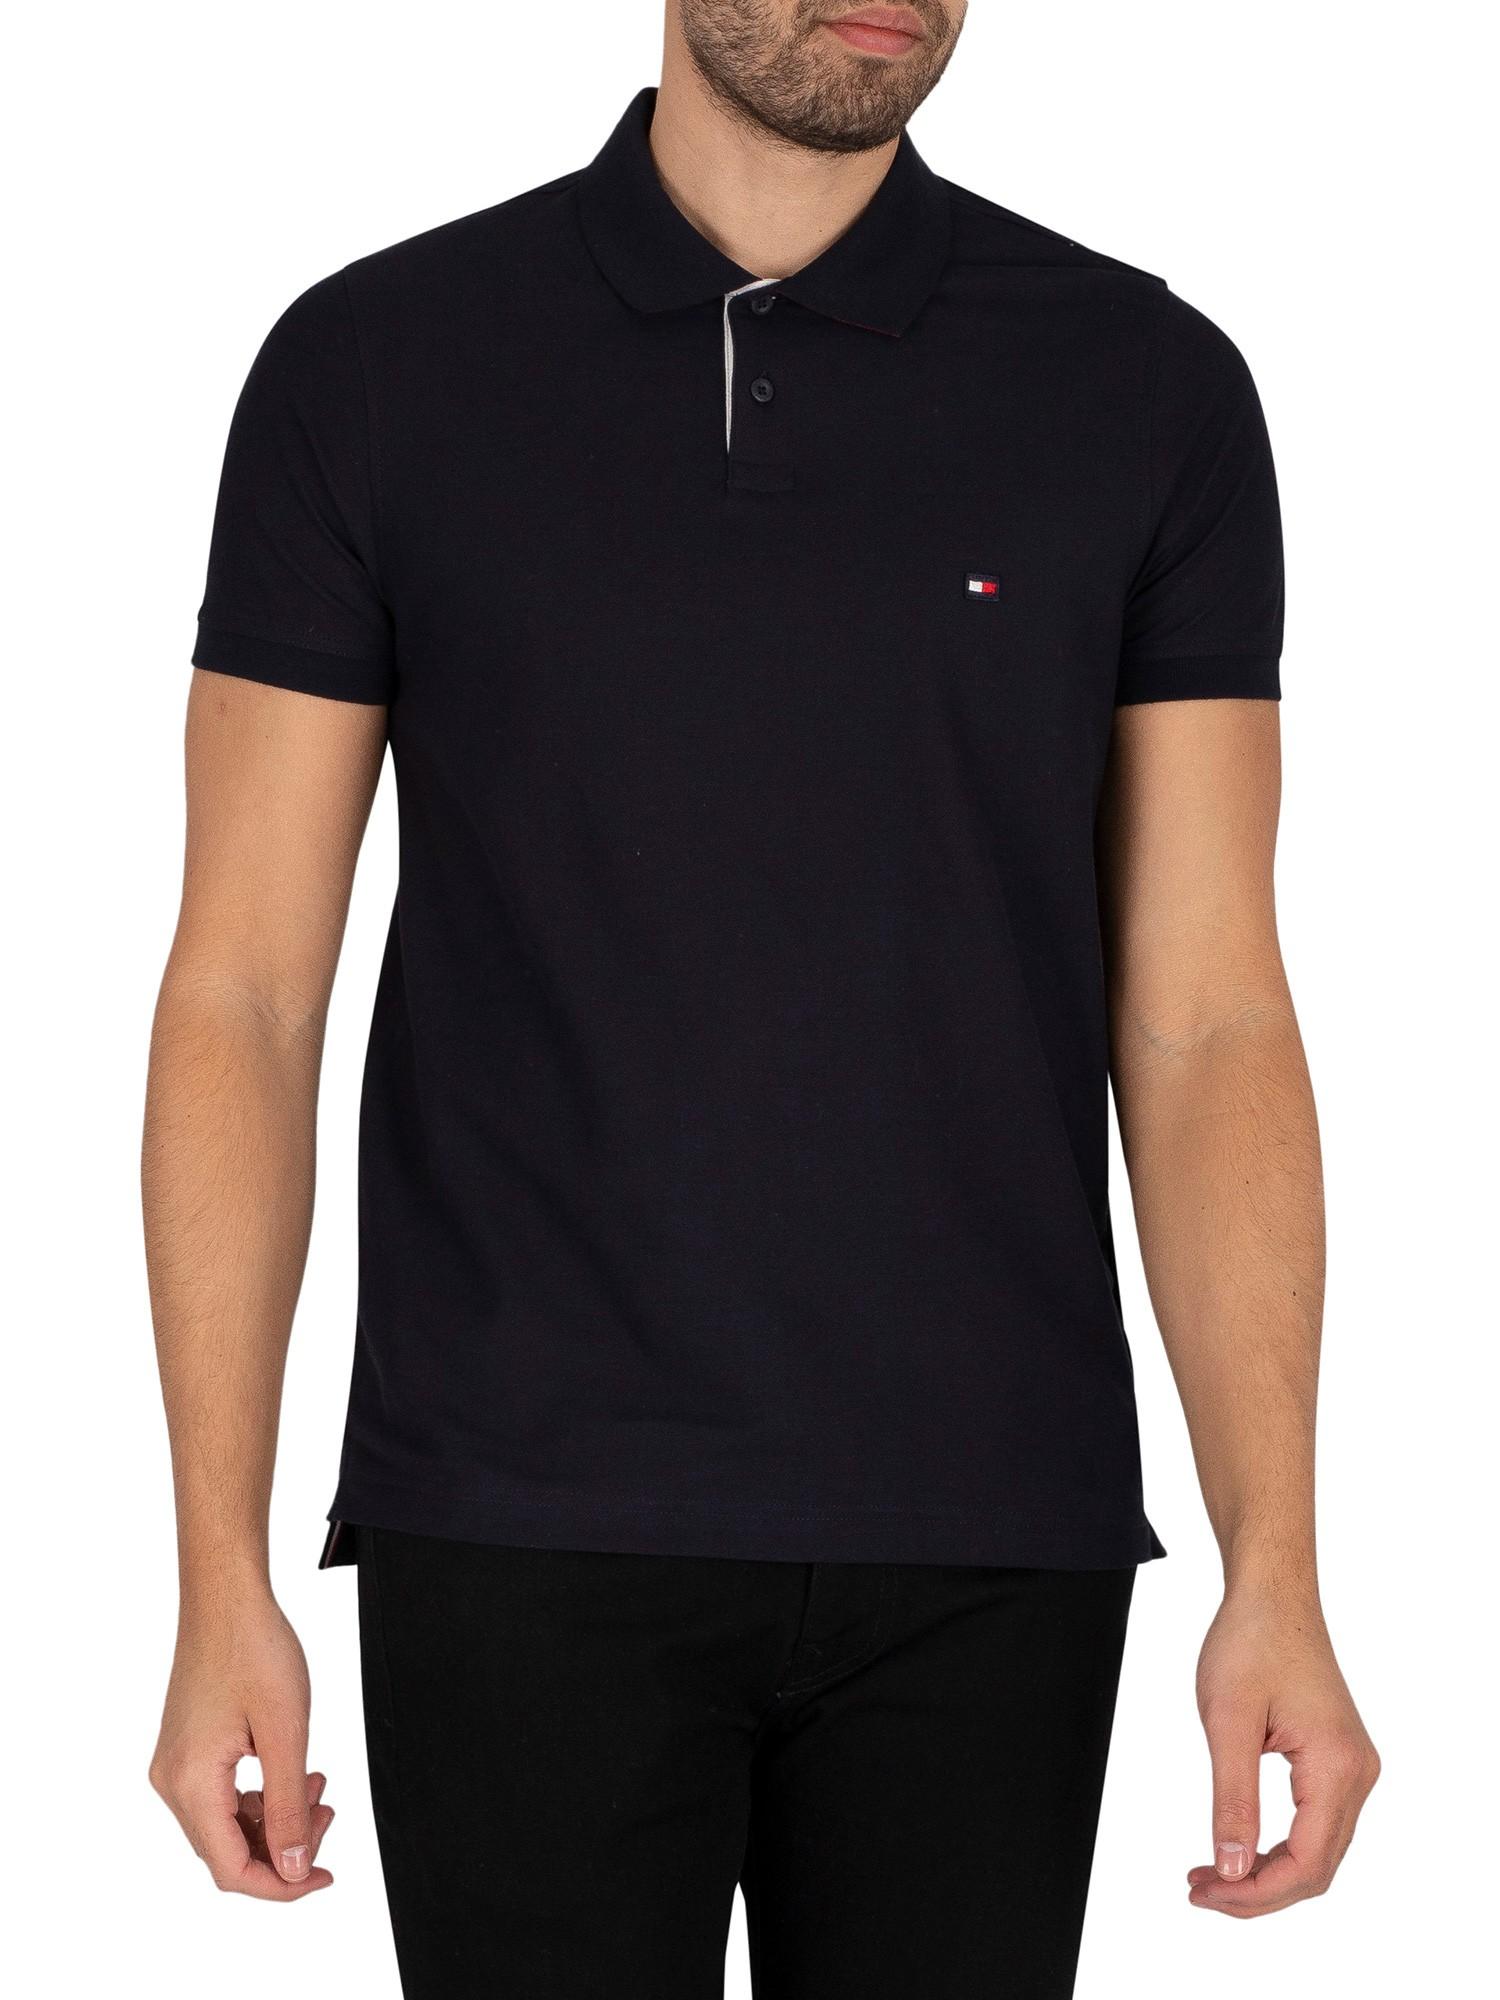 1985 Contrast Placket Slim Polo Shirt